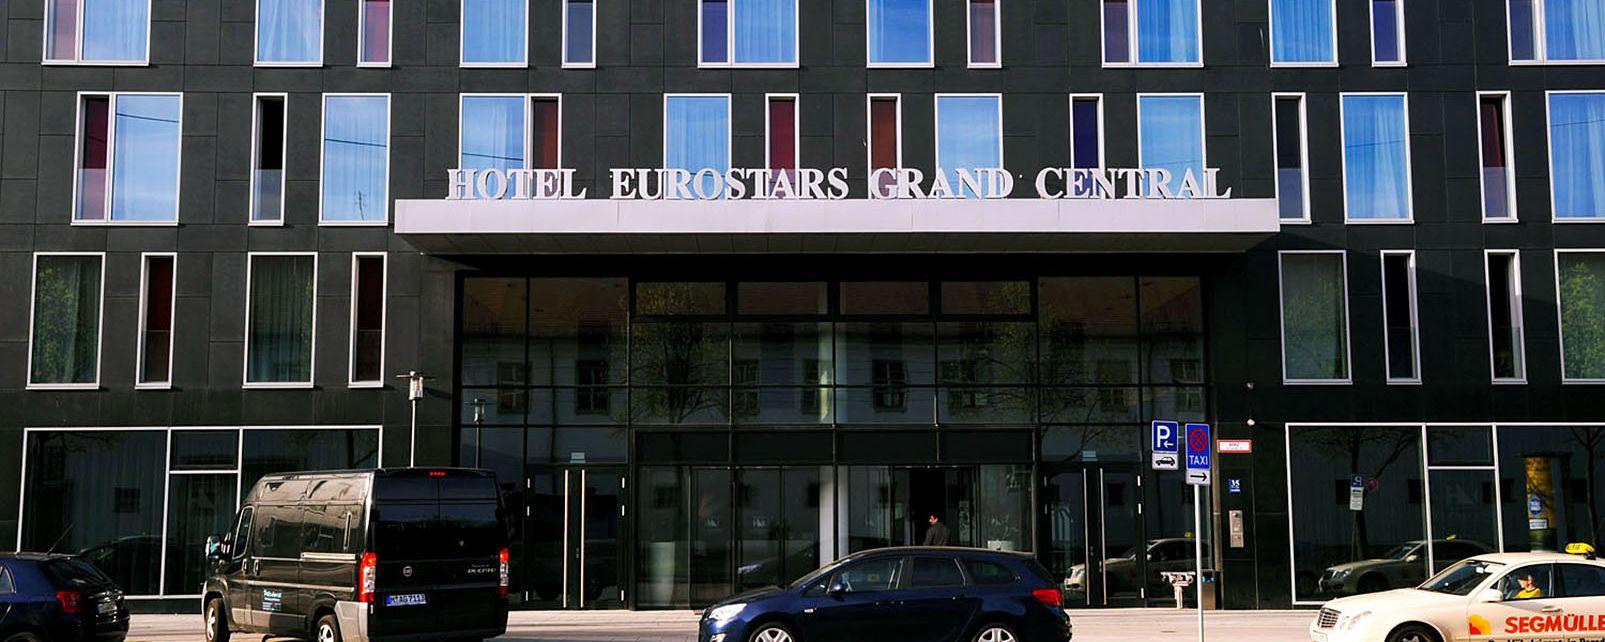 Hôtel Eurostars Grand Central